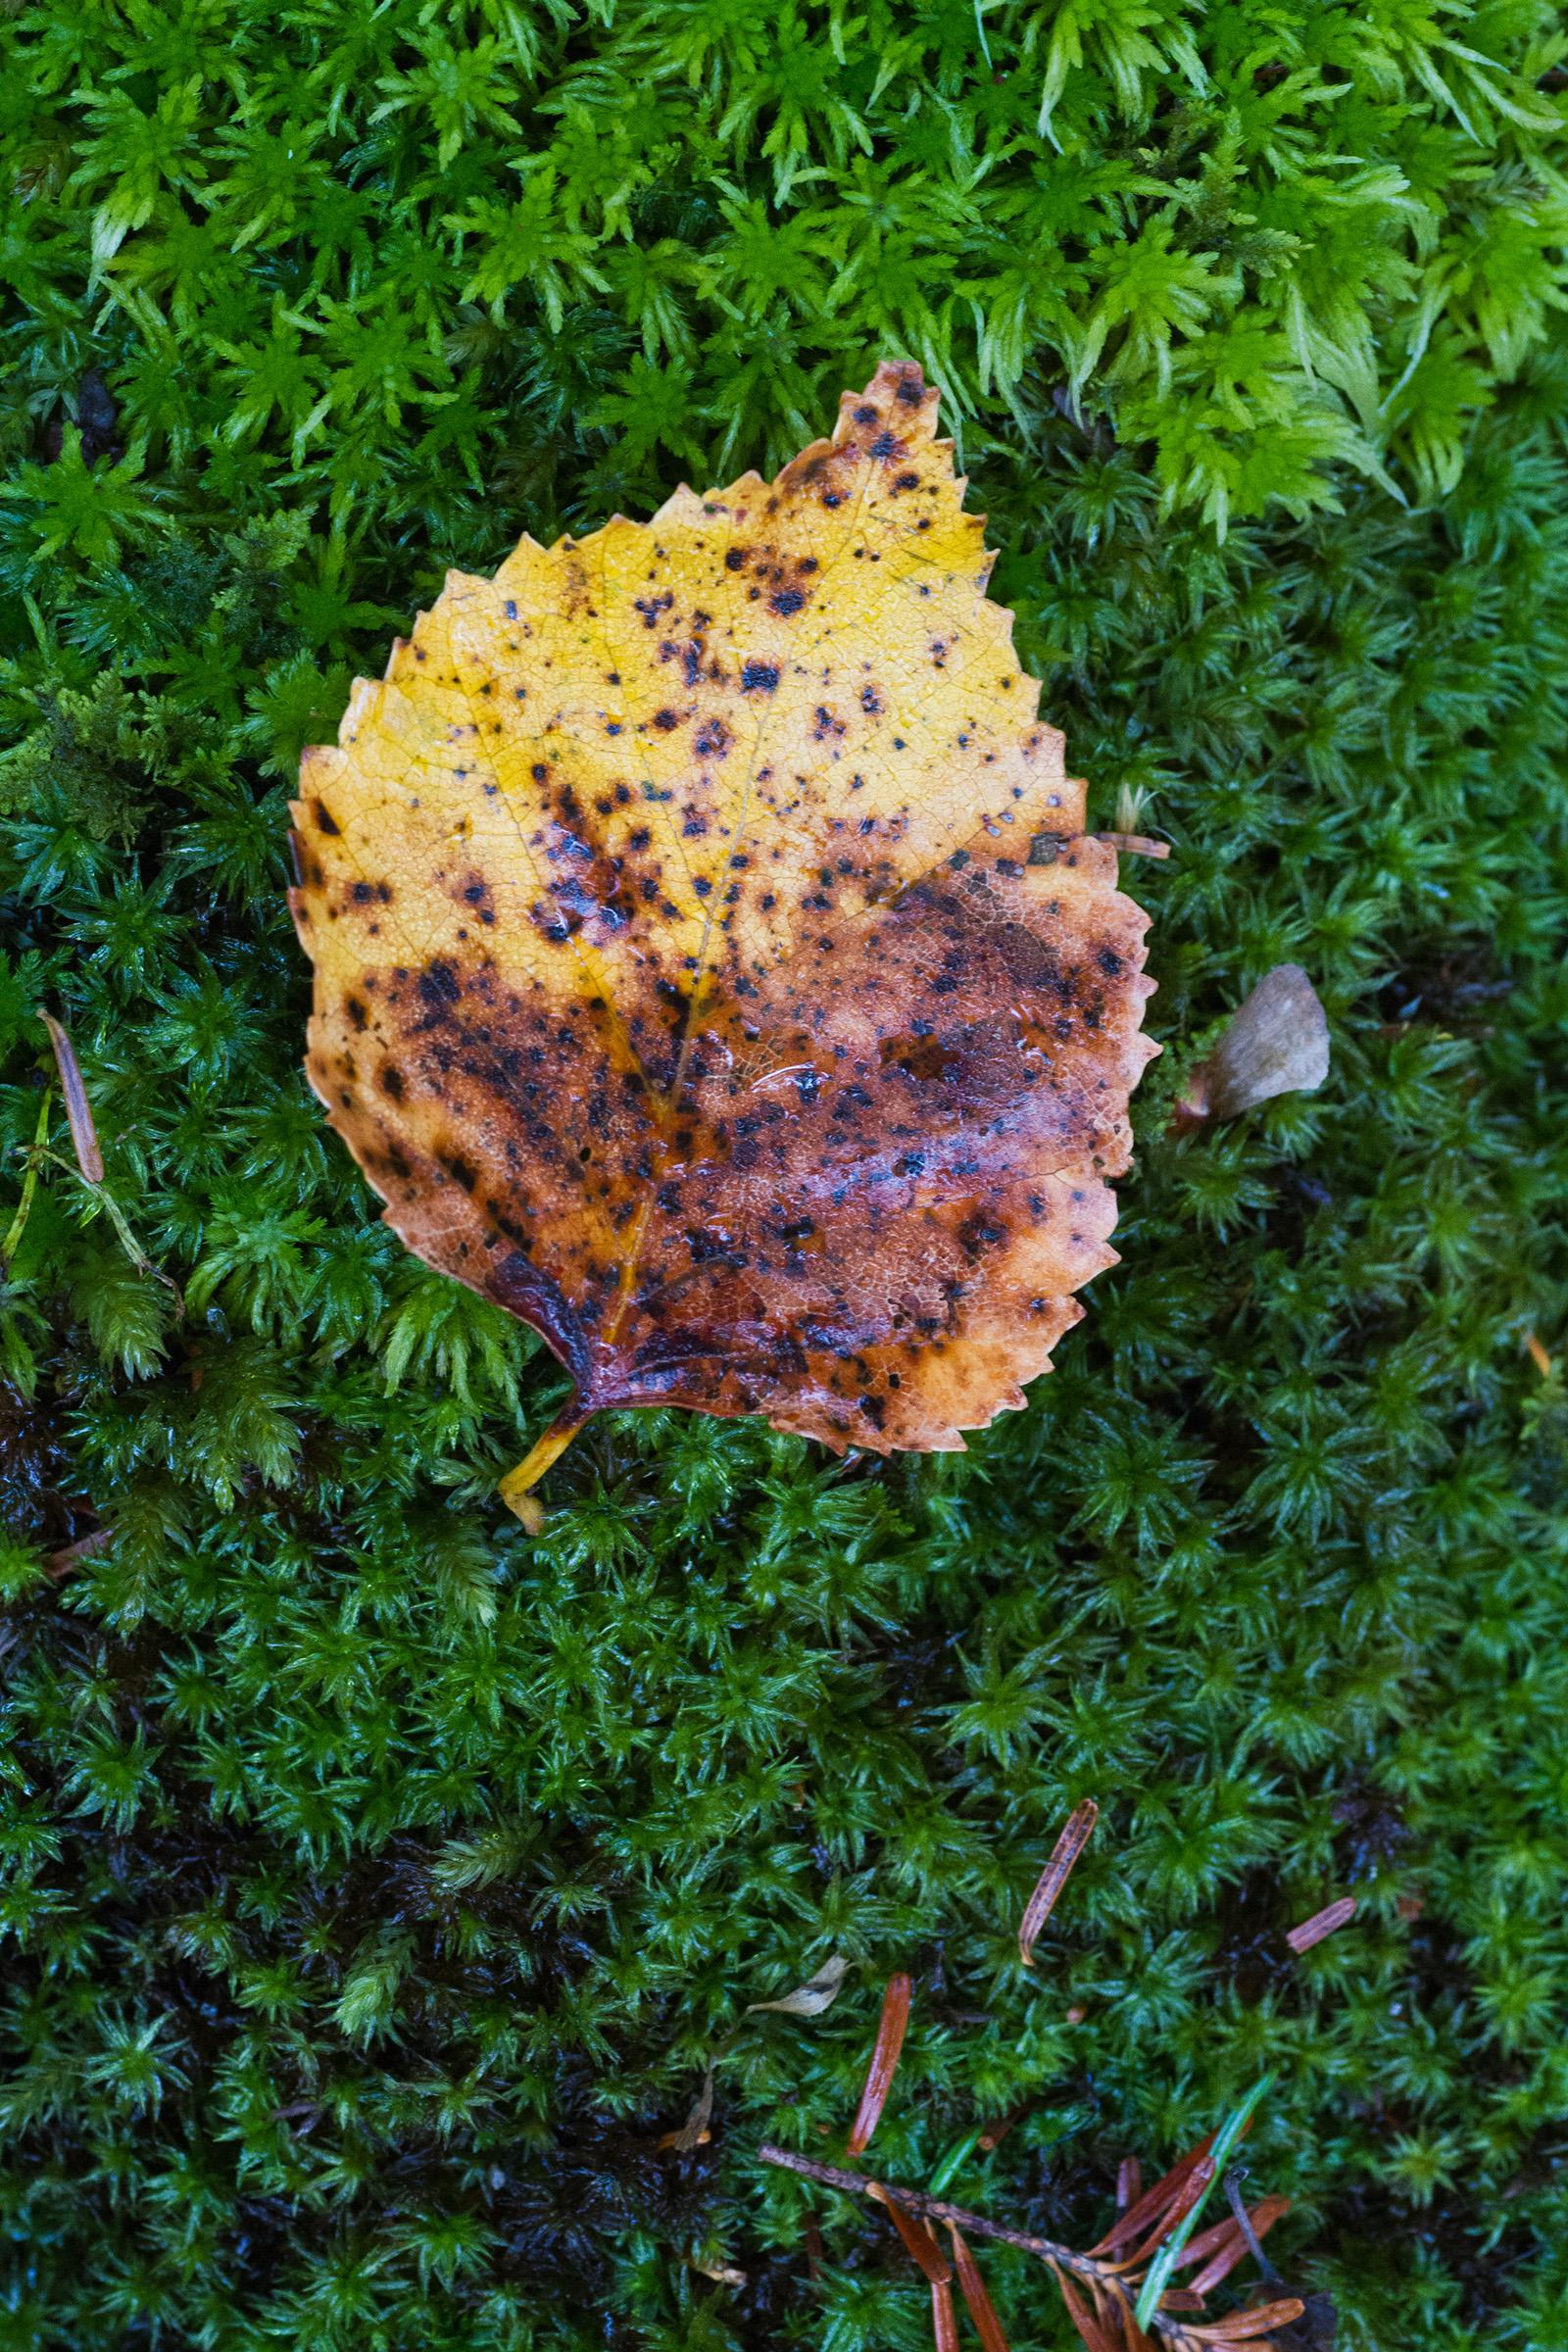 Autumn leaf, Autumn, Rug, November, October, HQ Photo